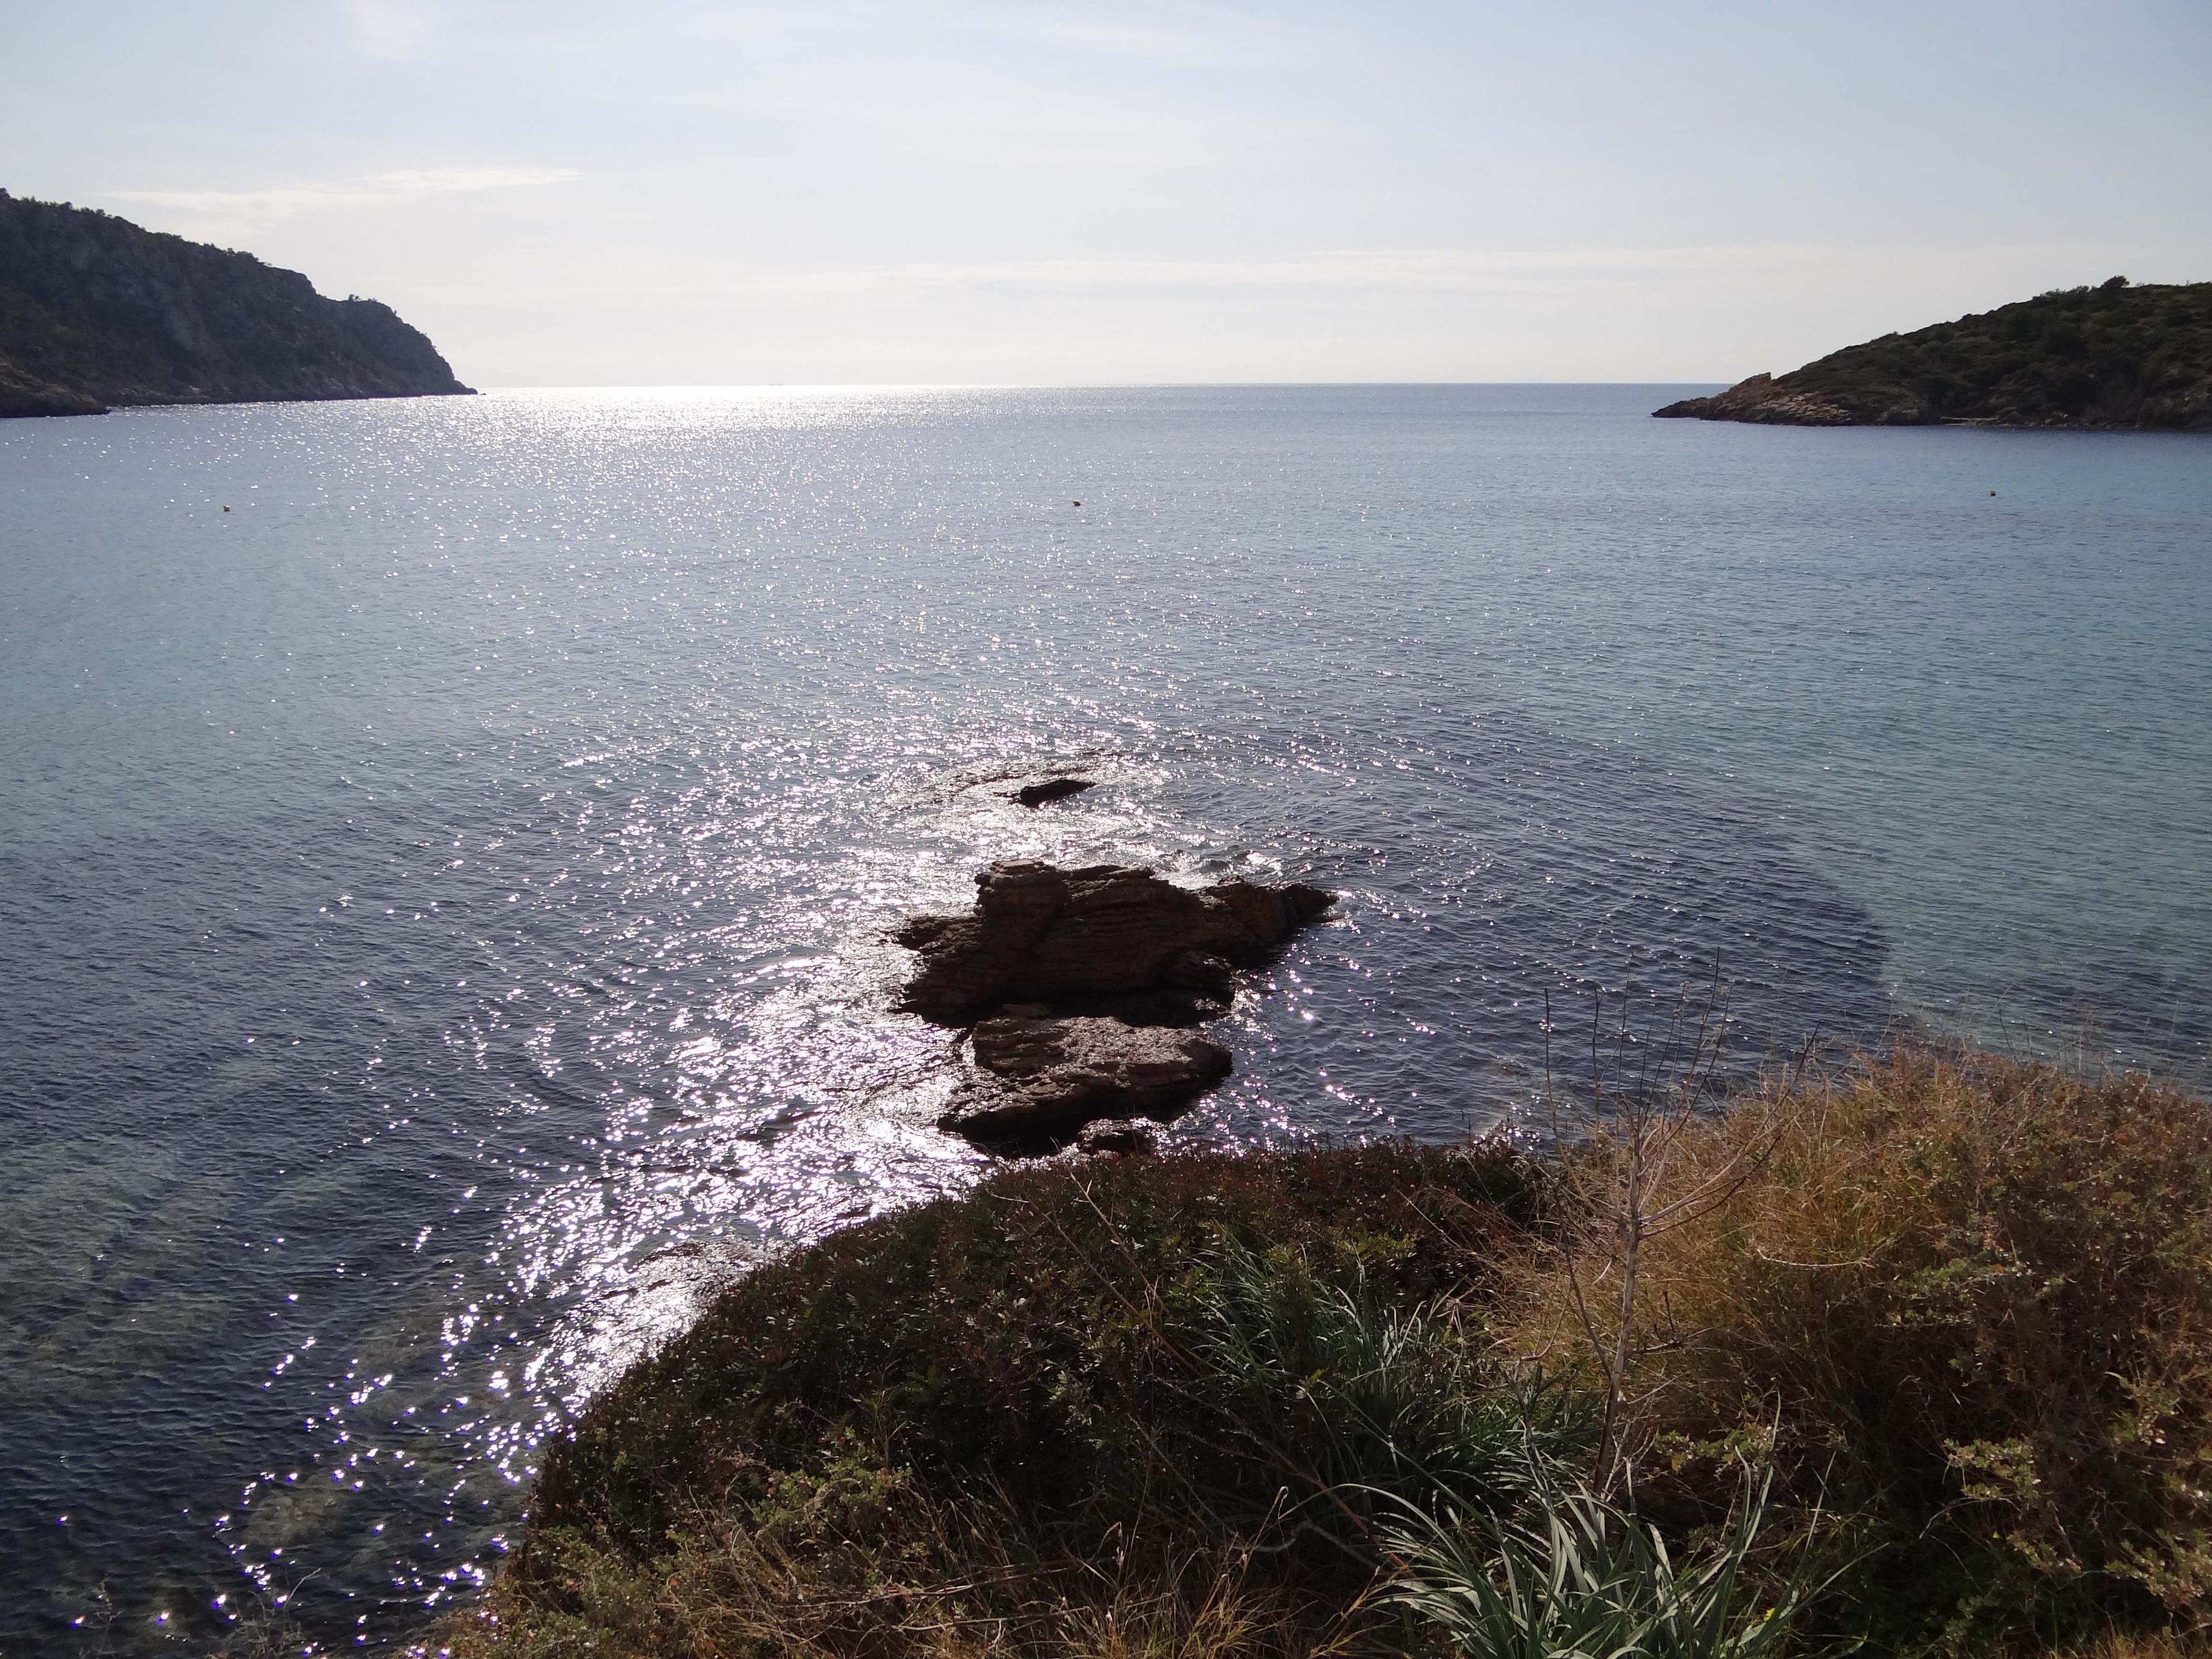 Sant Elm, Andraitx, Balearic Islands, Spain